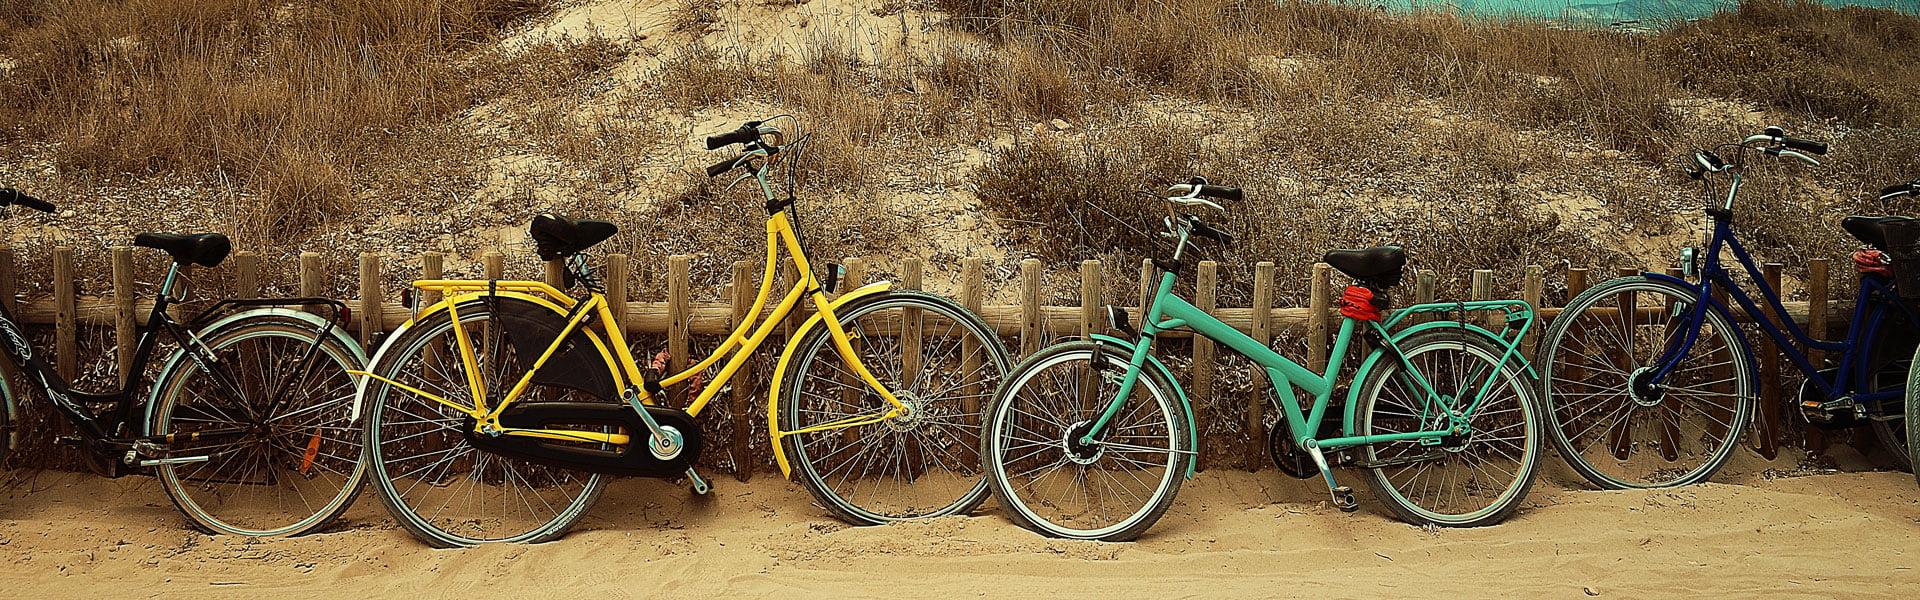 Visitar Valencia en bicicleta. Guía de turismo Valencia